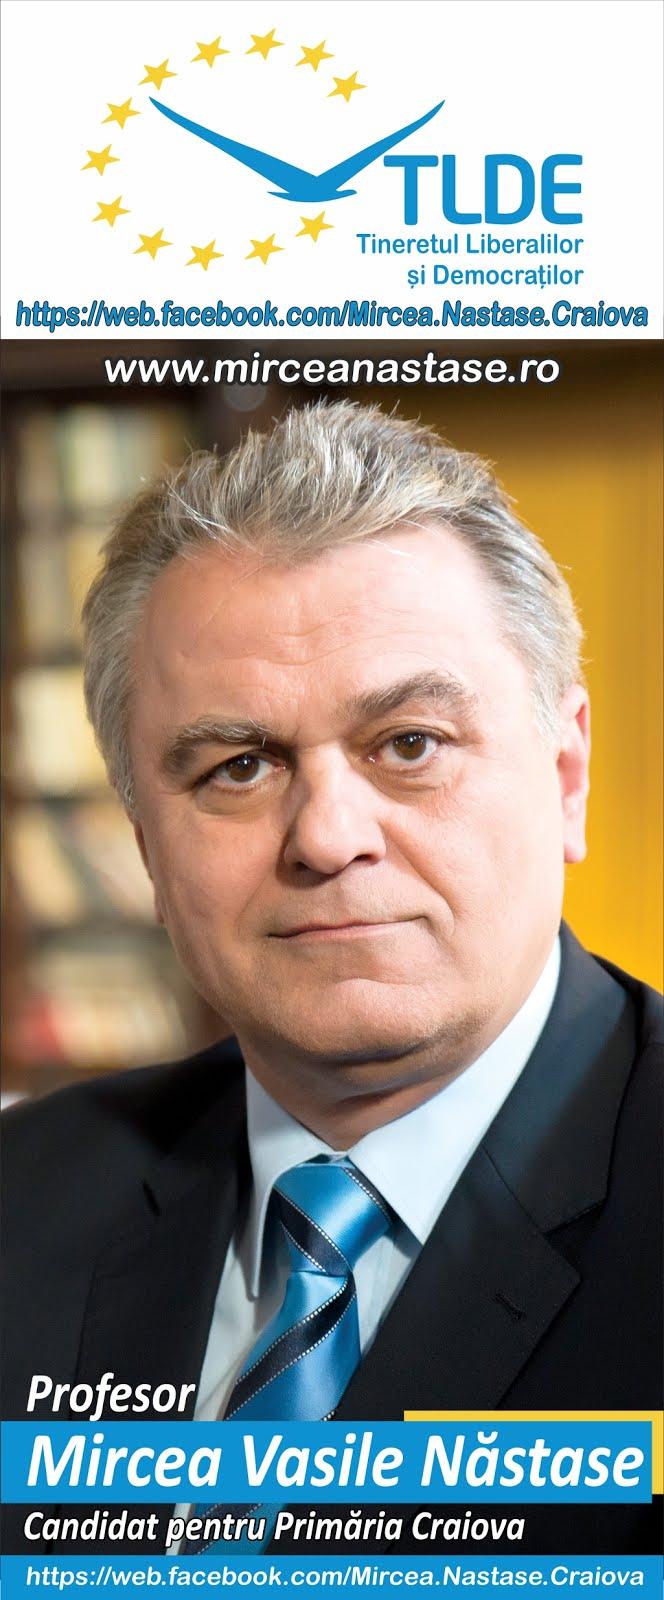 Sustin Mircea Nastase pentru primaria Craiova!